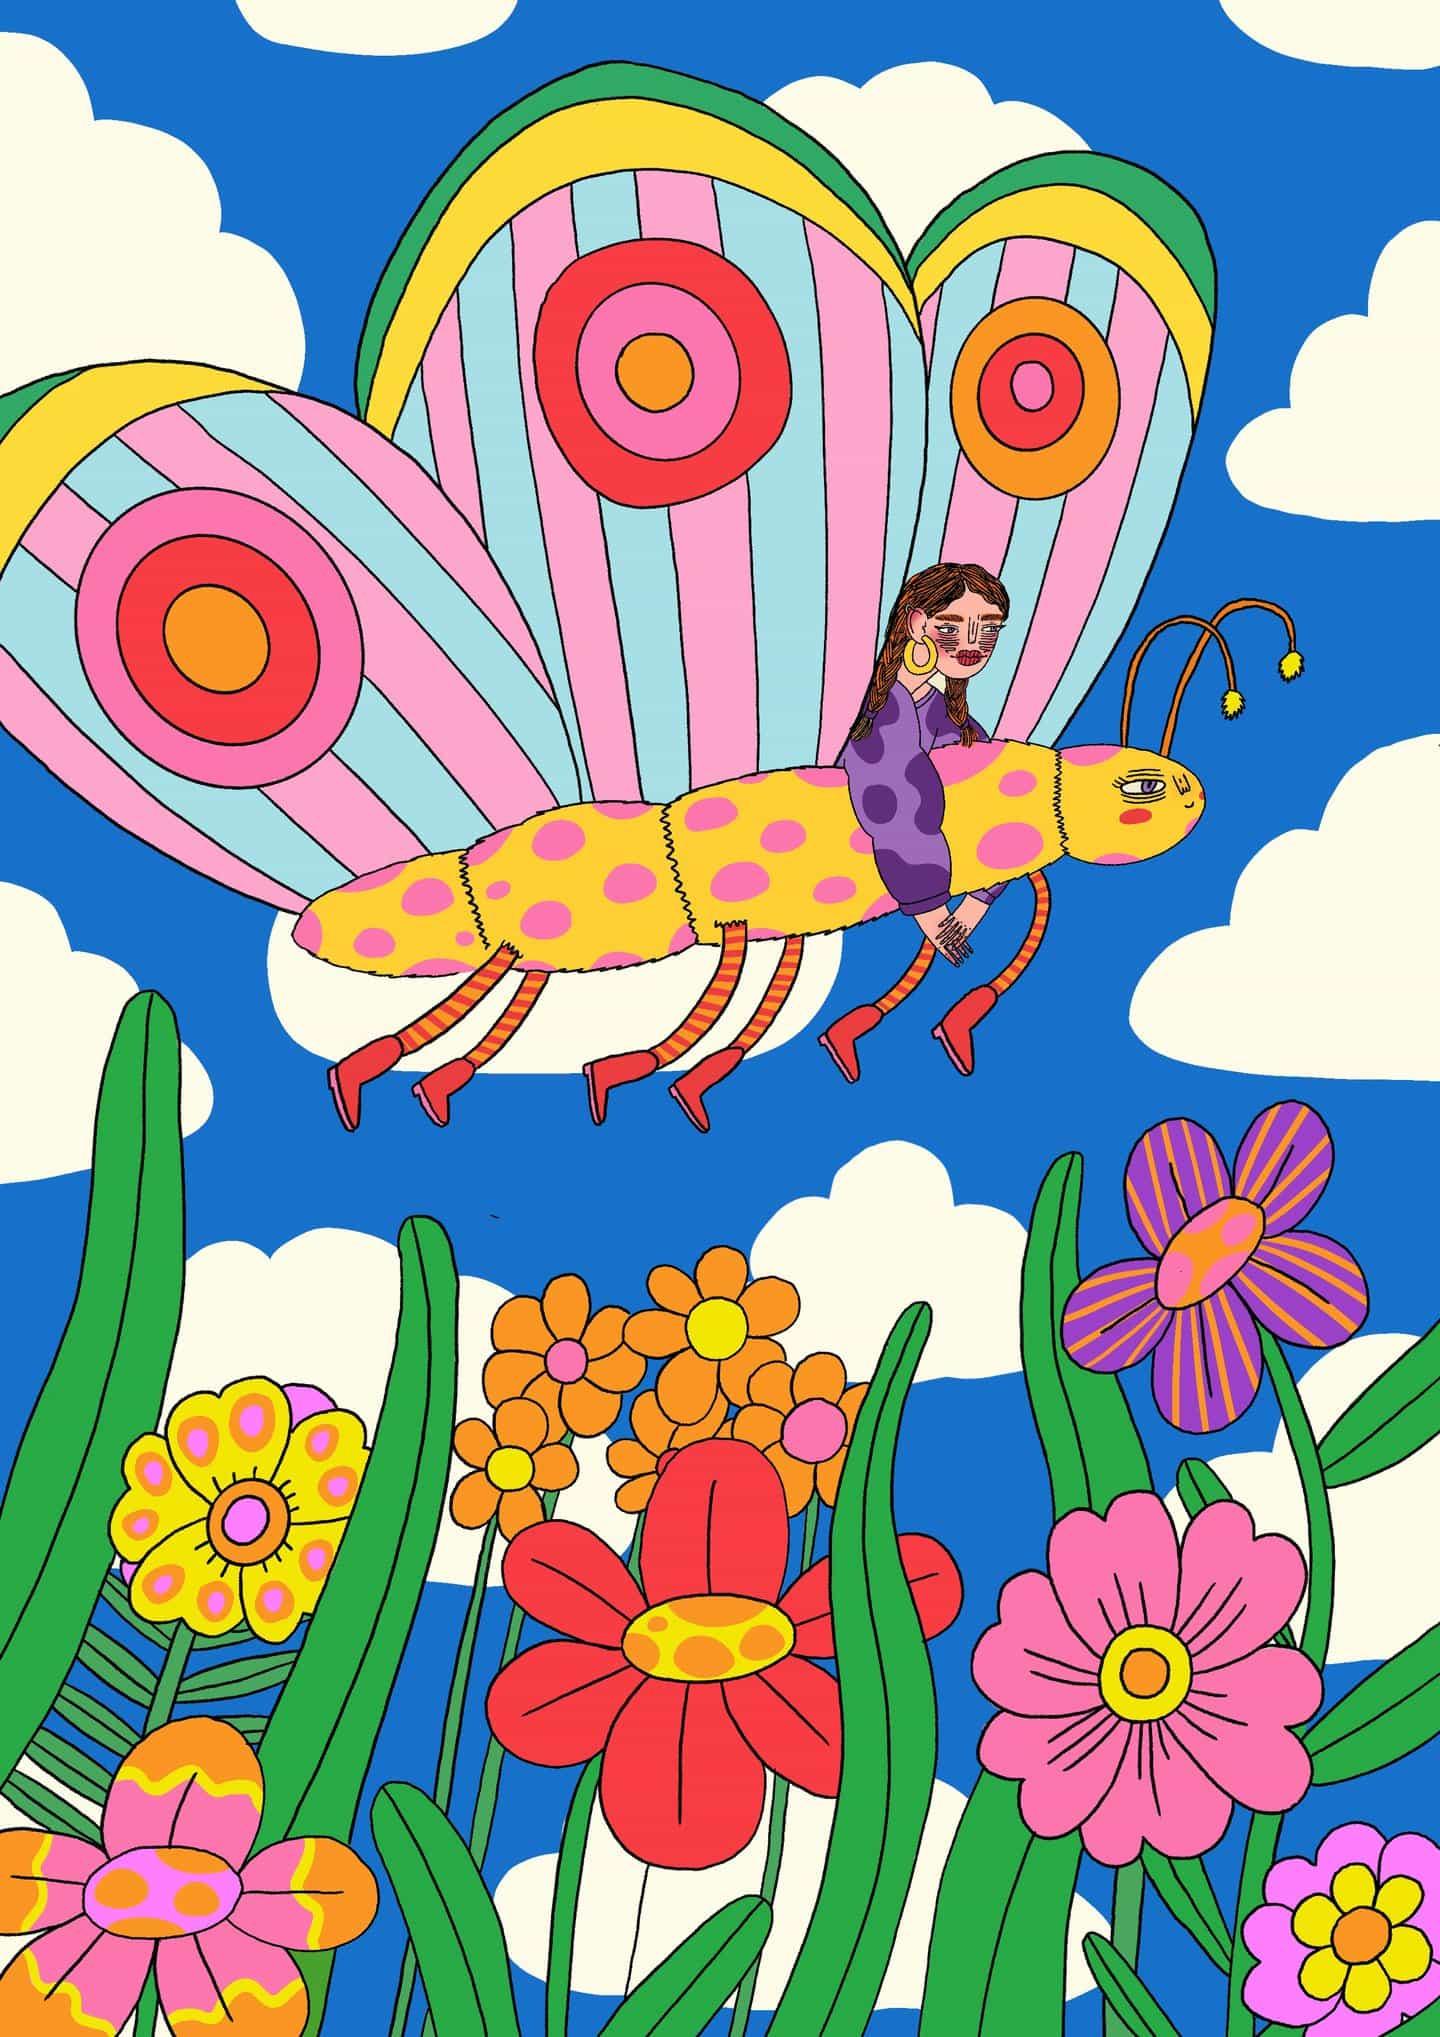 Ilustraciones de Doolittle (Eliza Williams): Butterfly pal (Copyright © Doolittle Illustrations, noviembre de 2020)